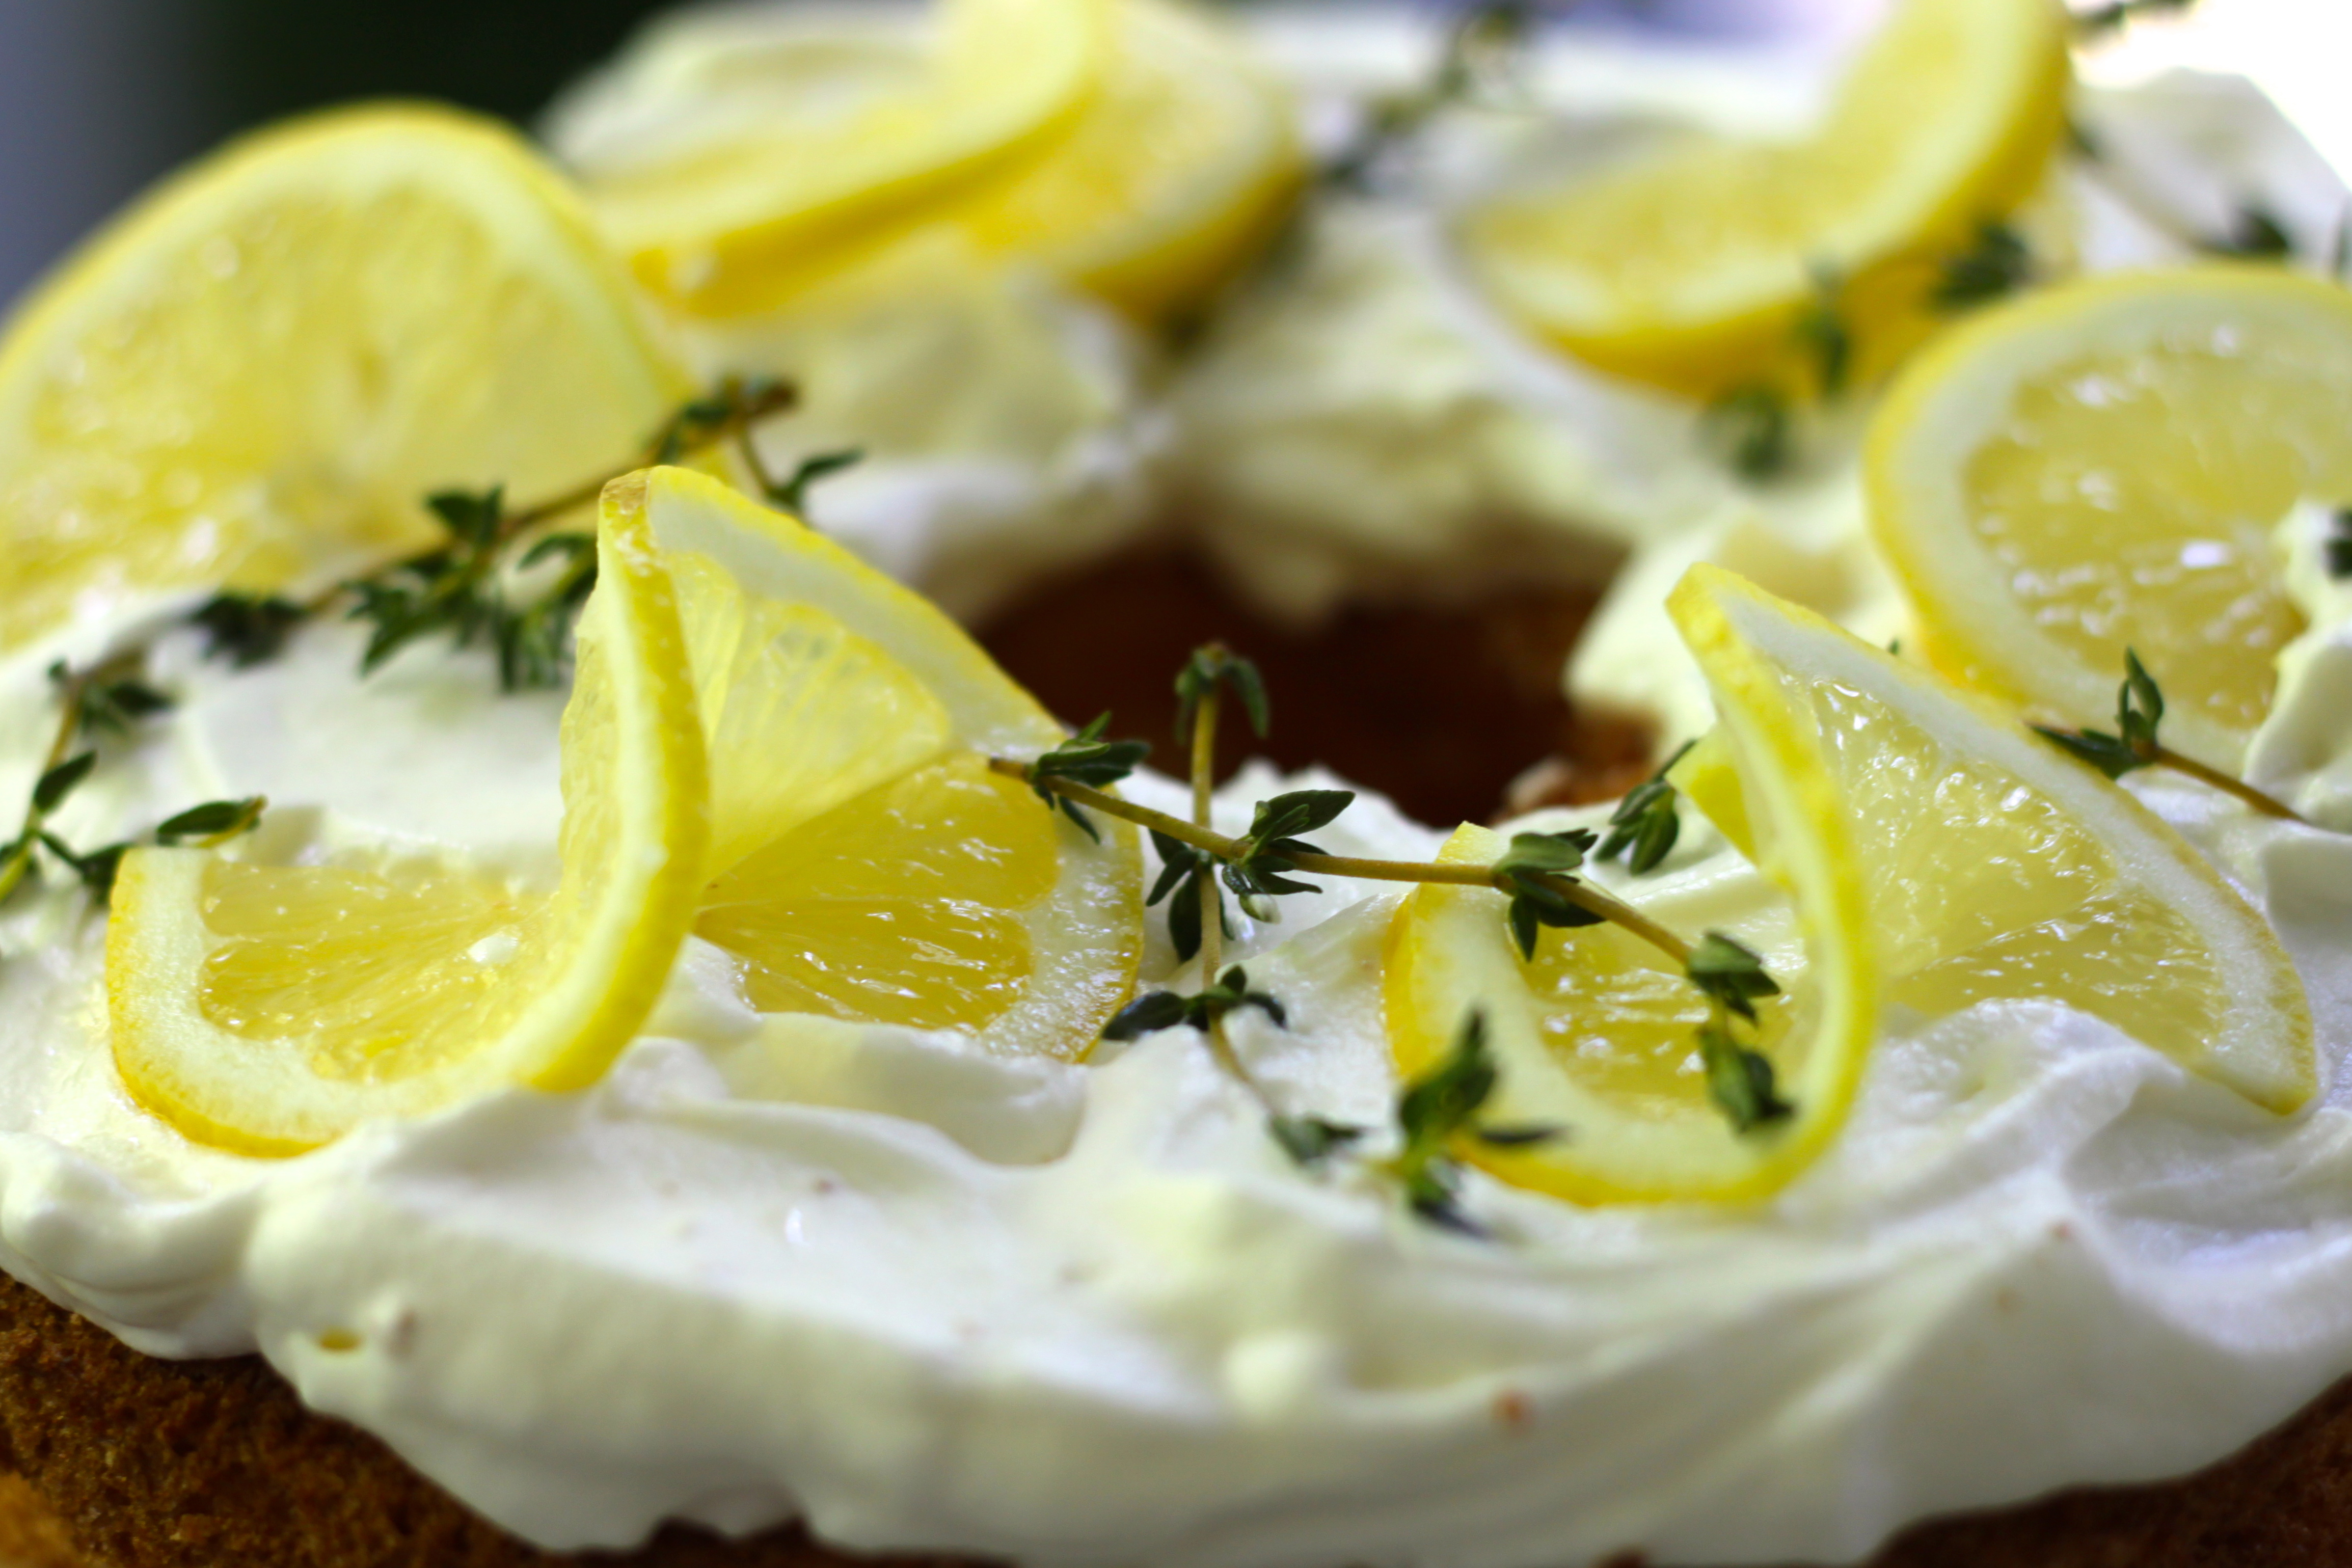 Lemon Twist Garnish Cake